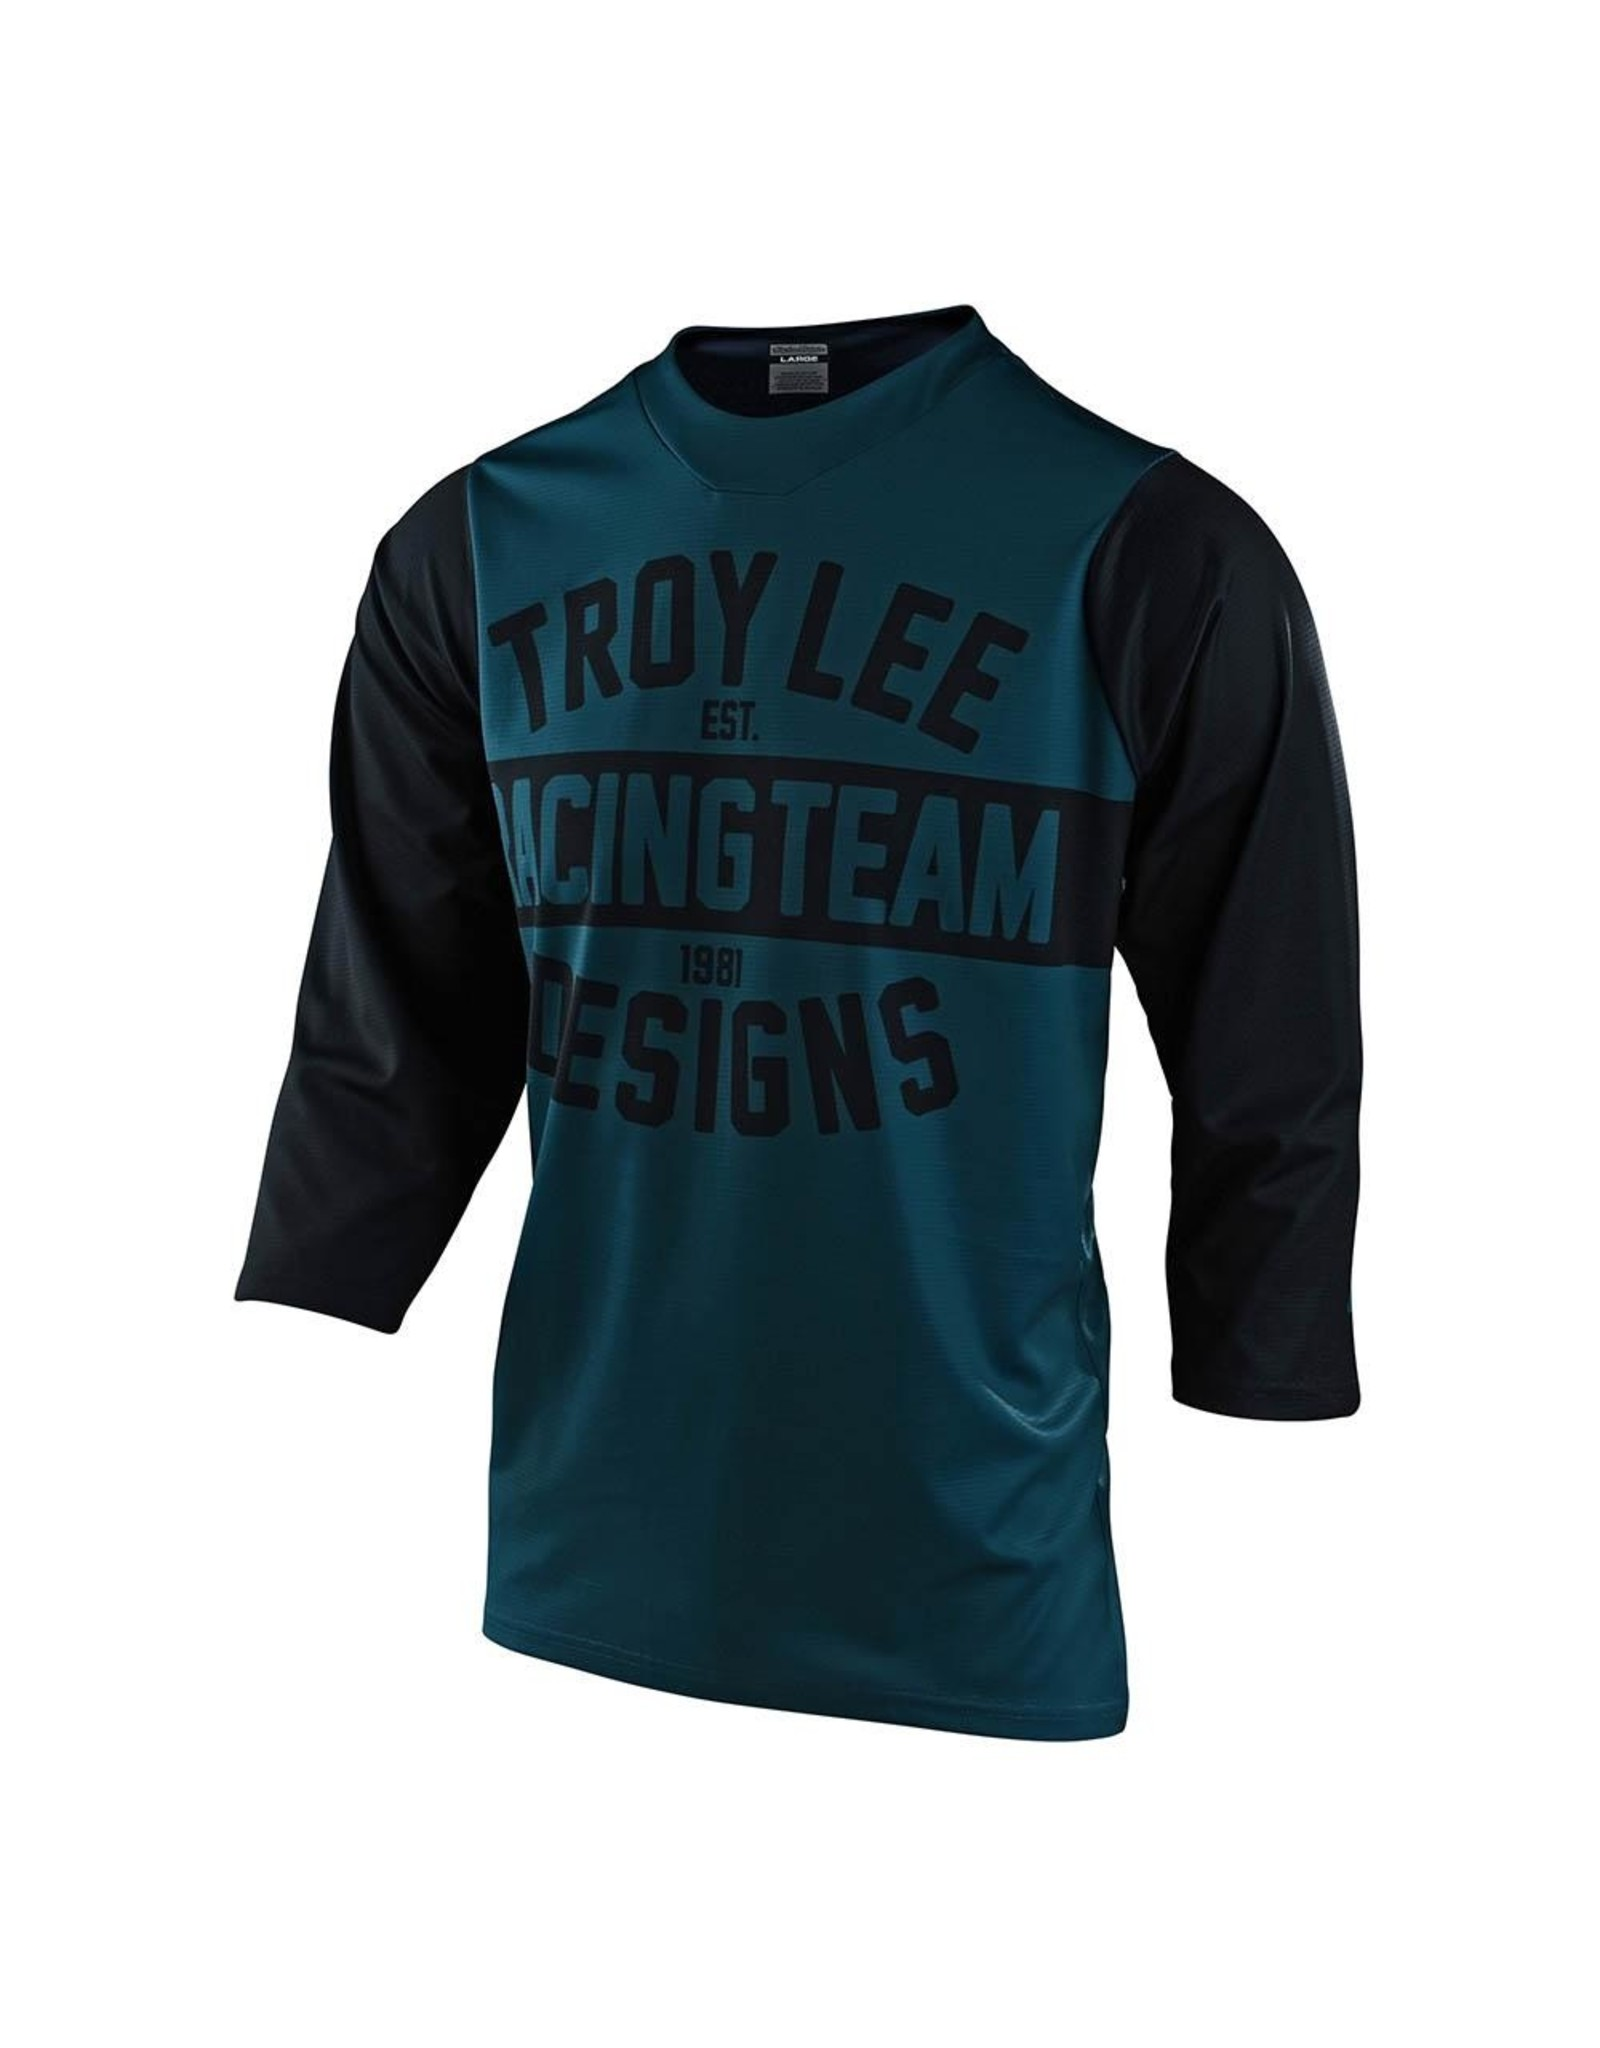 Troy Lee Designs TLD 21 TROY LEE DESIGNS RUCKUS 3/4 JERSEY